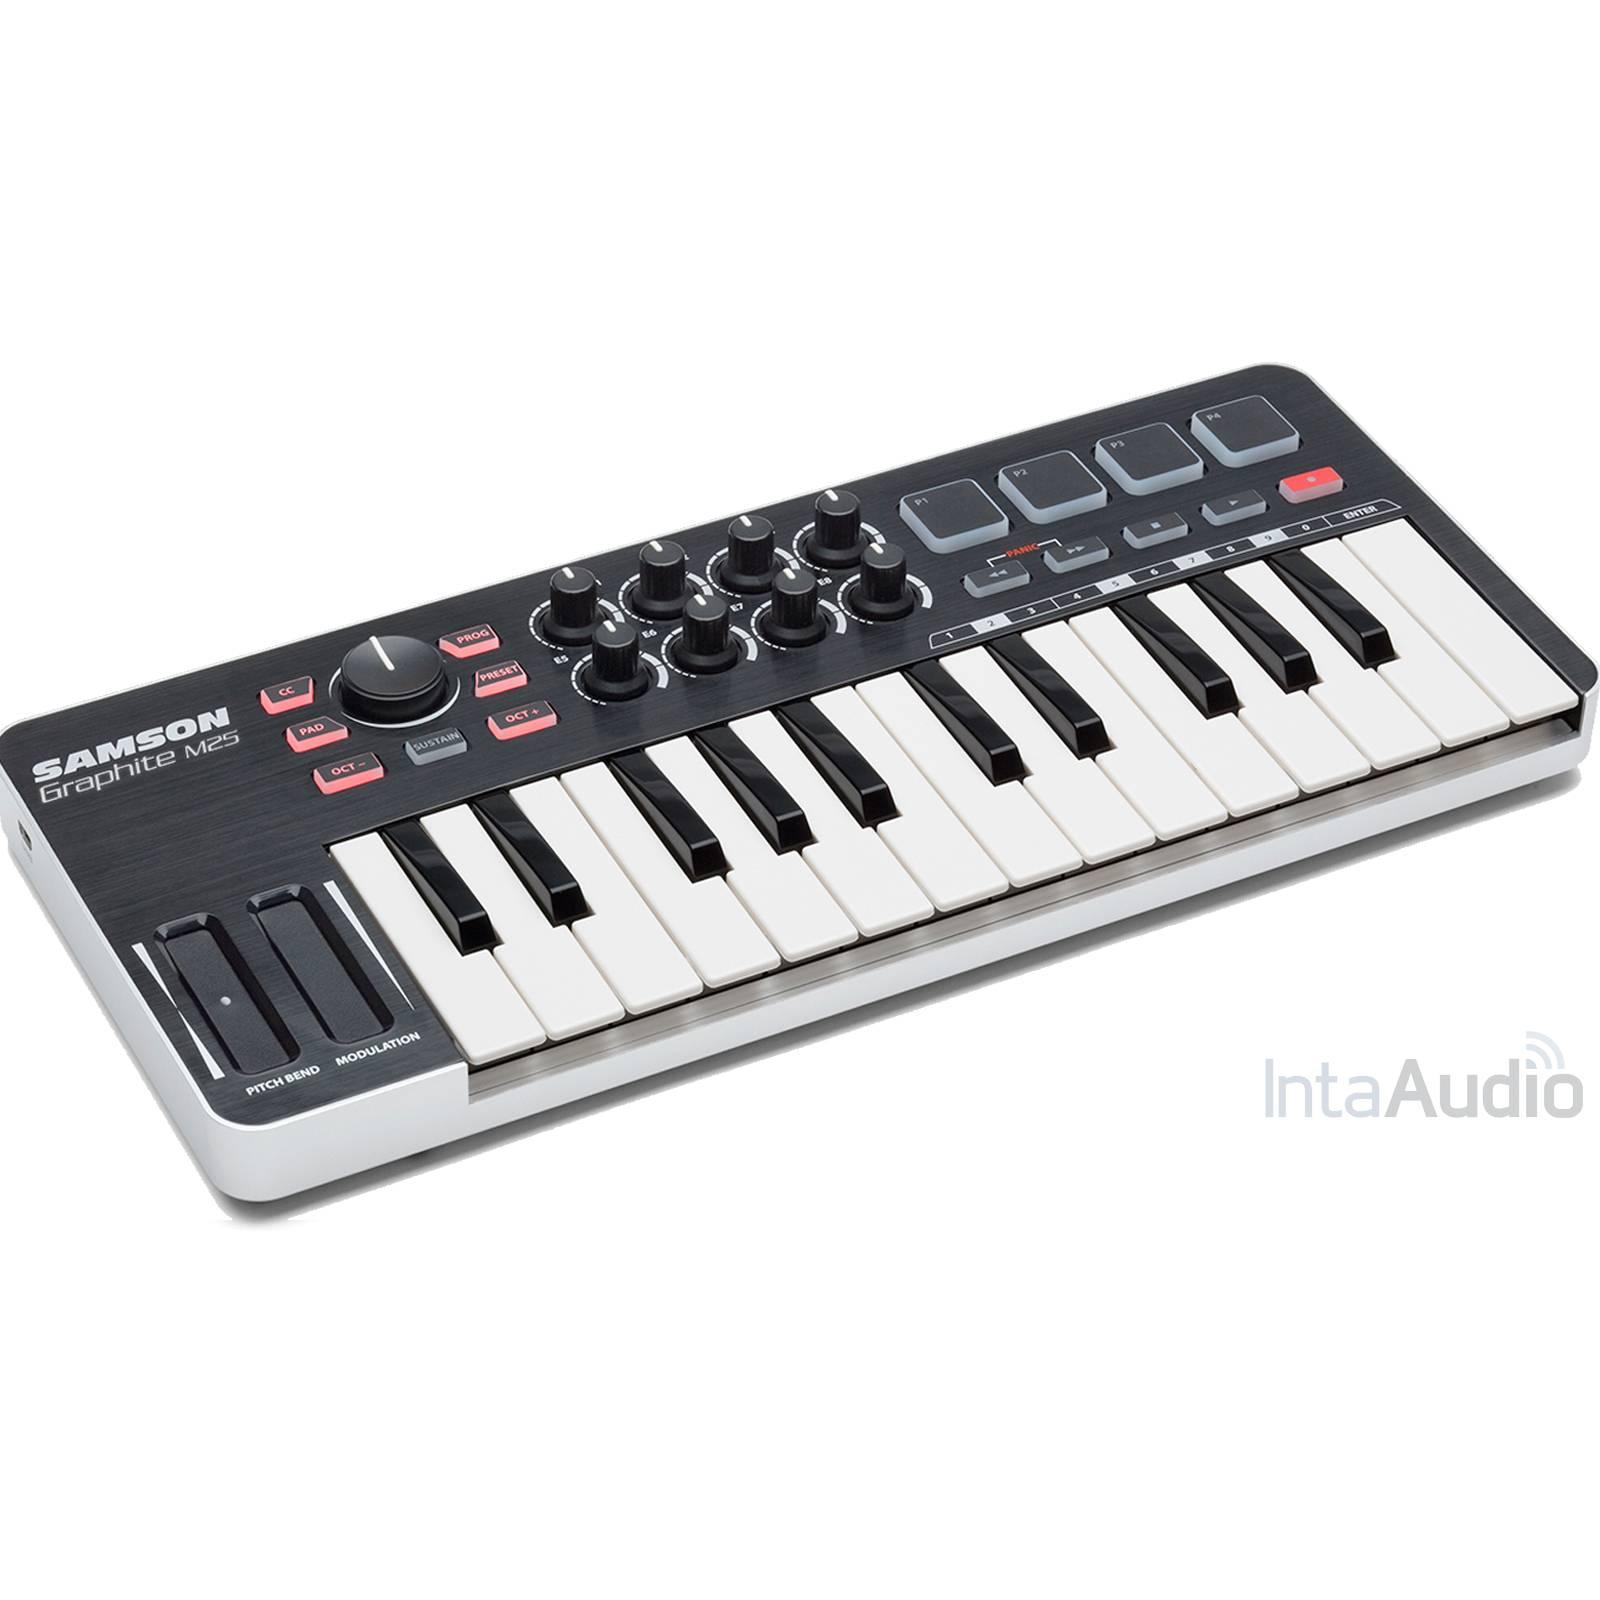 samson graphite 25 mini usb and ipad midi keyboard midi keyboard from inta audio uk. Black Bedroom Furniture Sets. Home Design Ideas